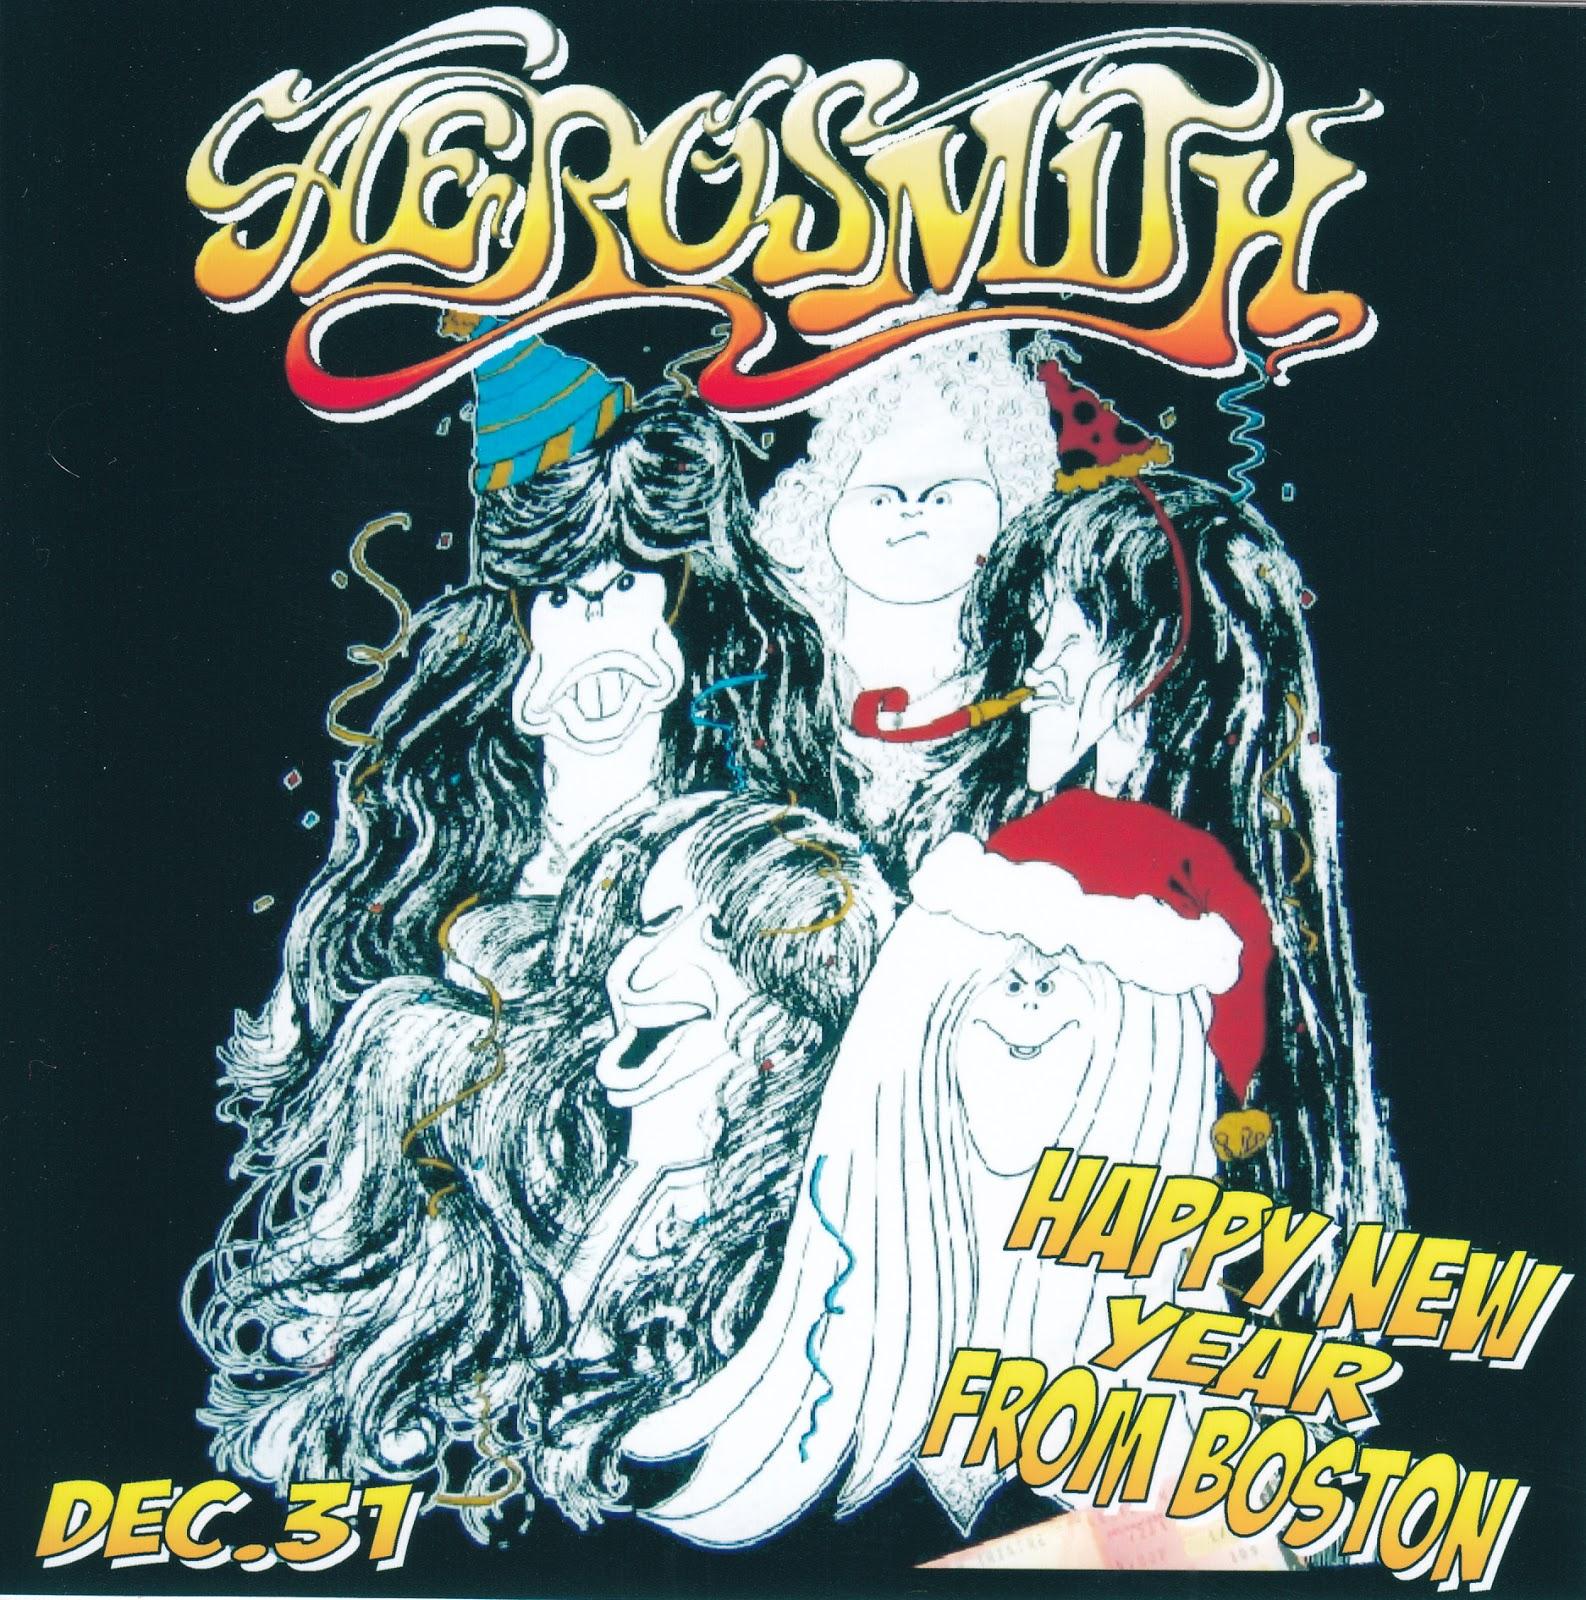 Aerosmith Bootlegs Cover Arts Happy New Year From Boston